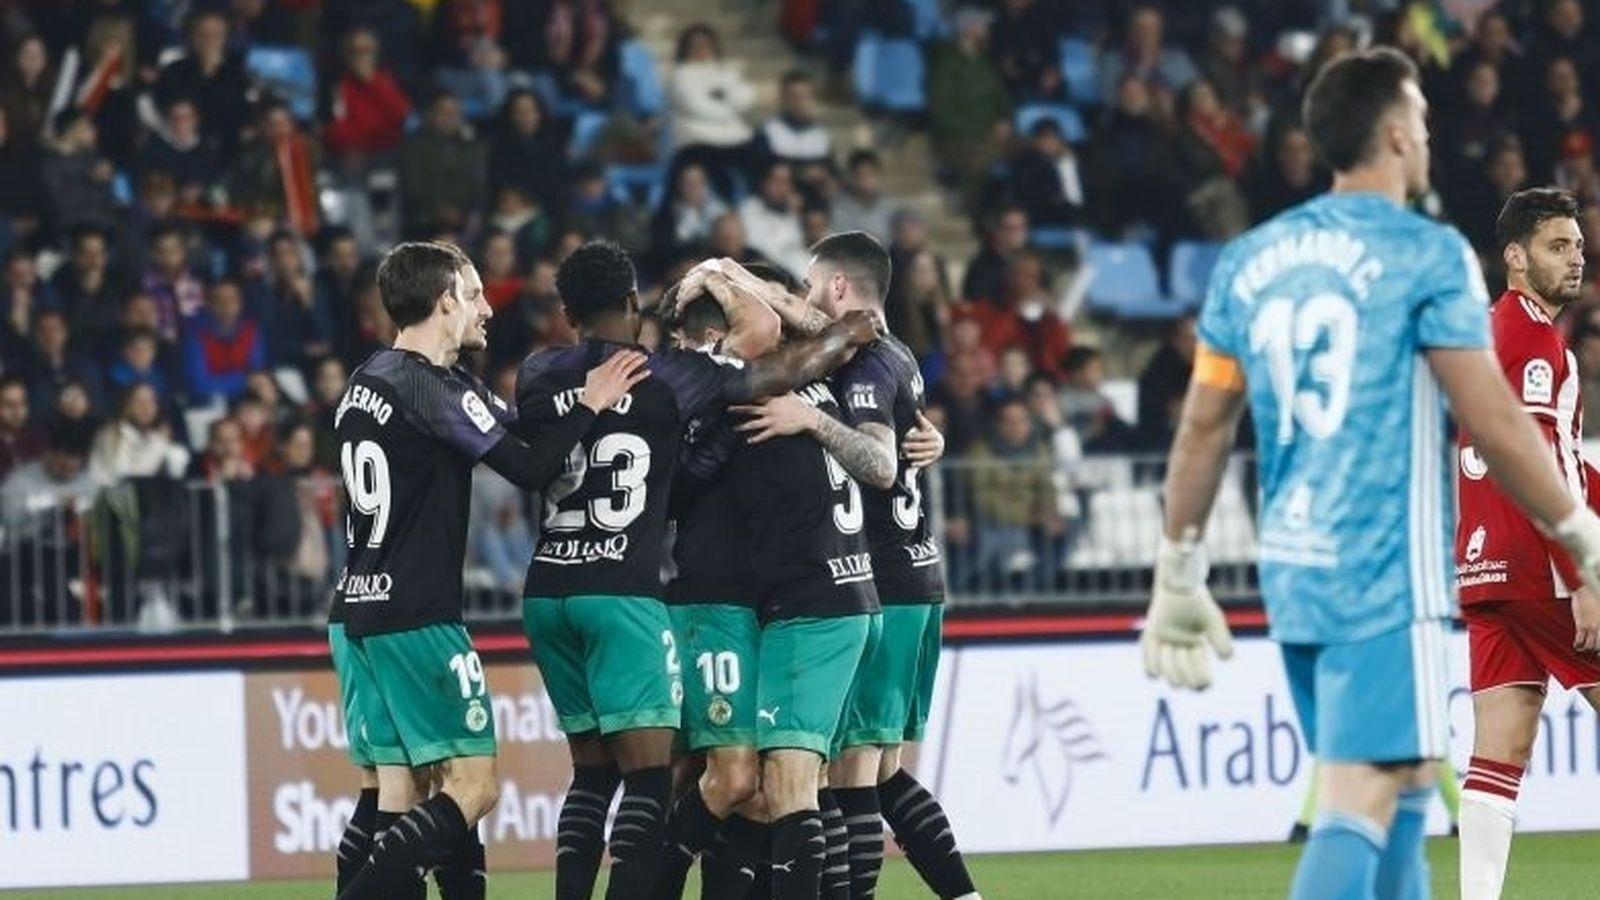 Foto: Jugadores del Racing de Santander celebran un gol. (Europa Press)